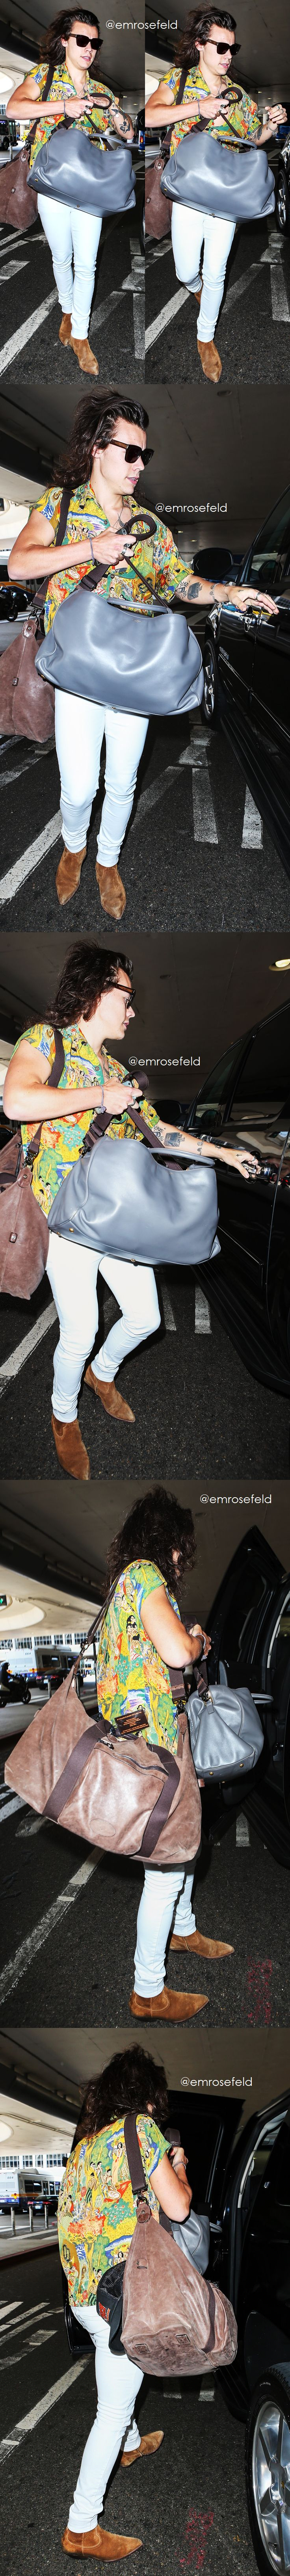 Harry Styles | at LAX 7.3.15 | @emrosefeld |